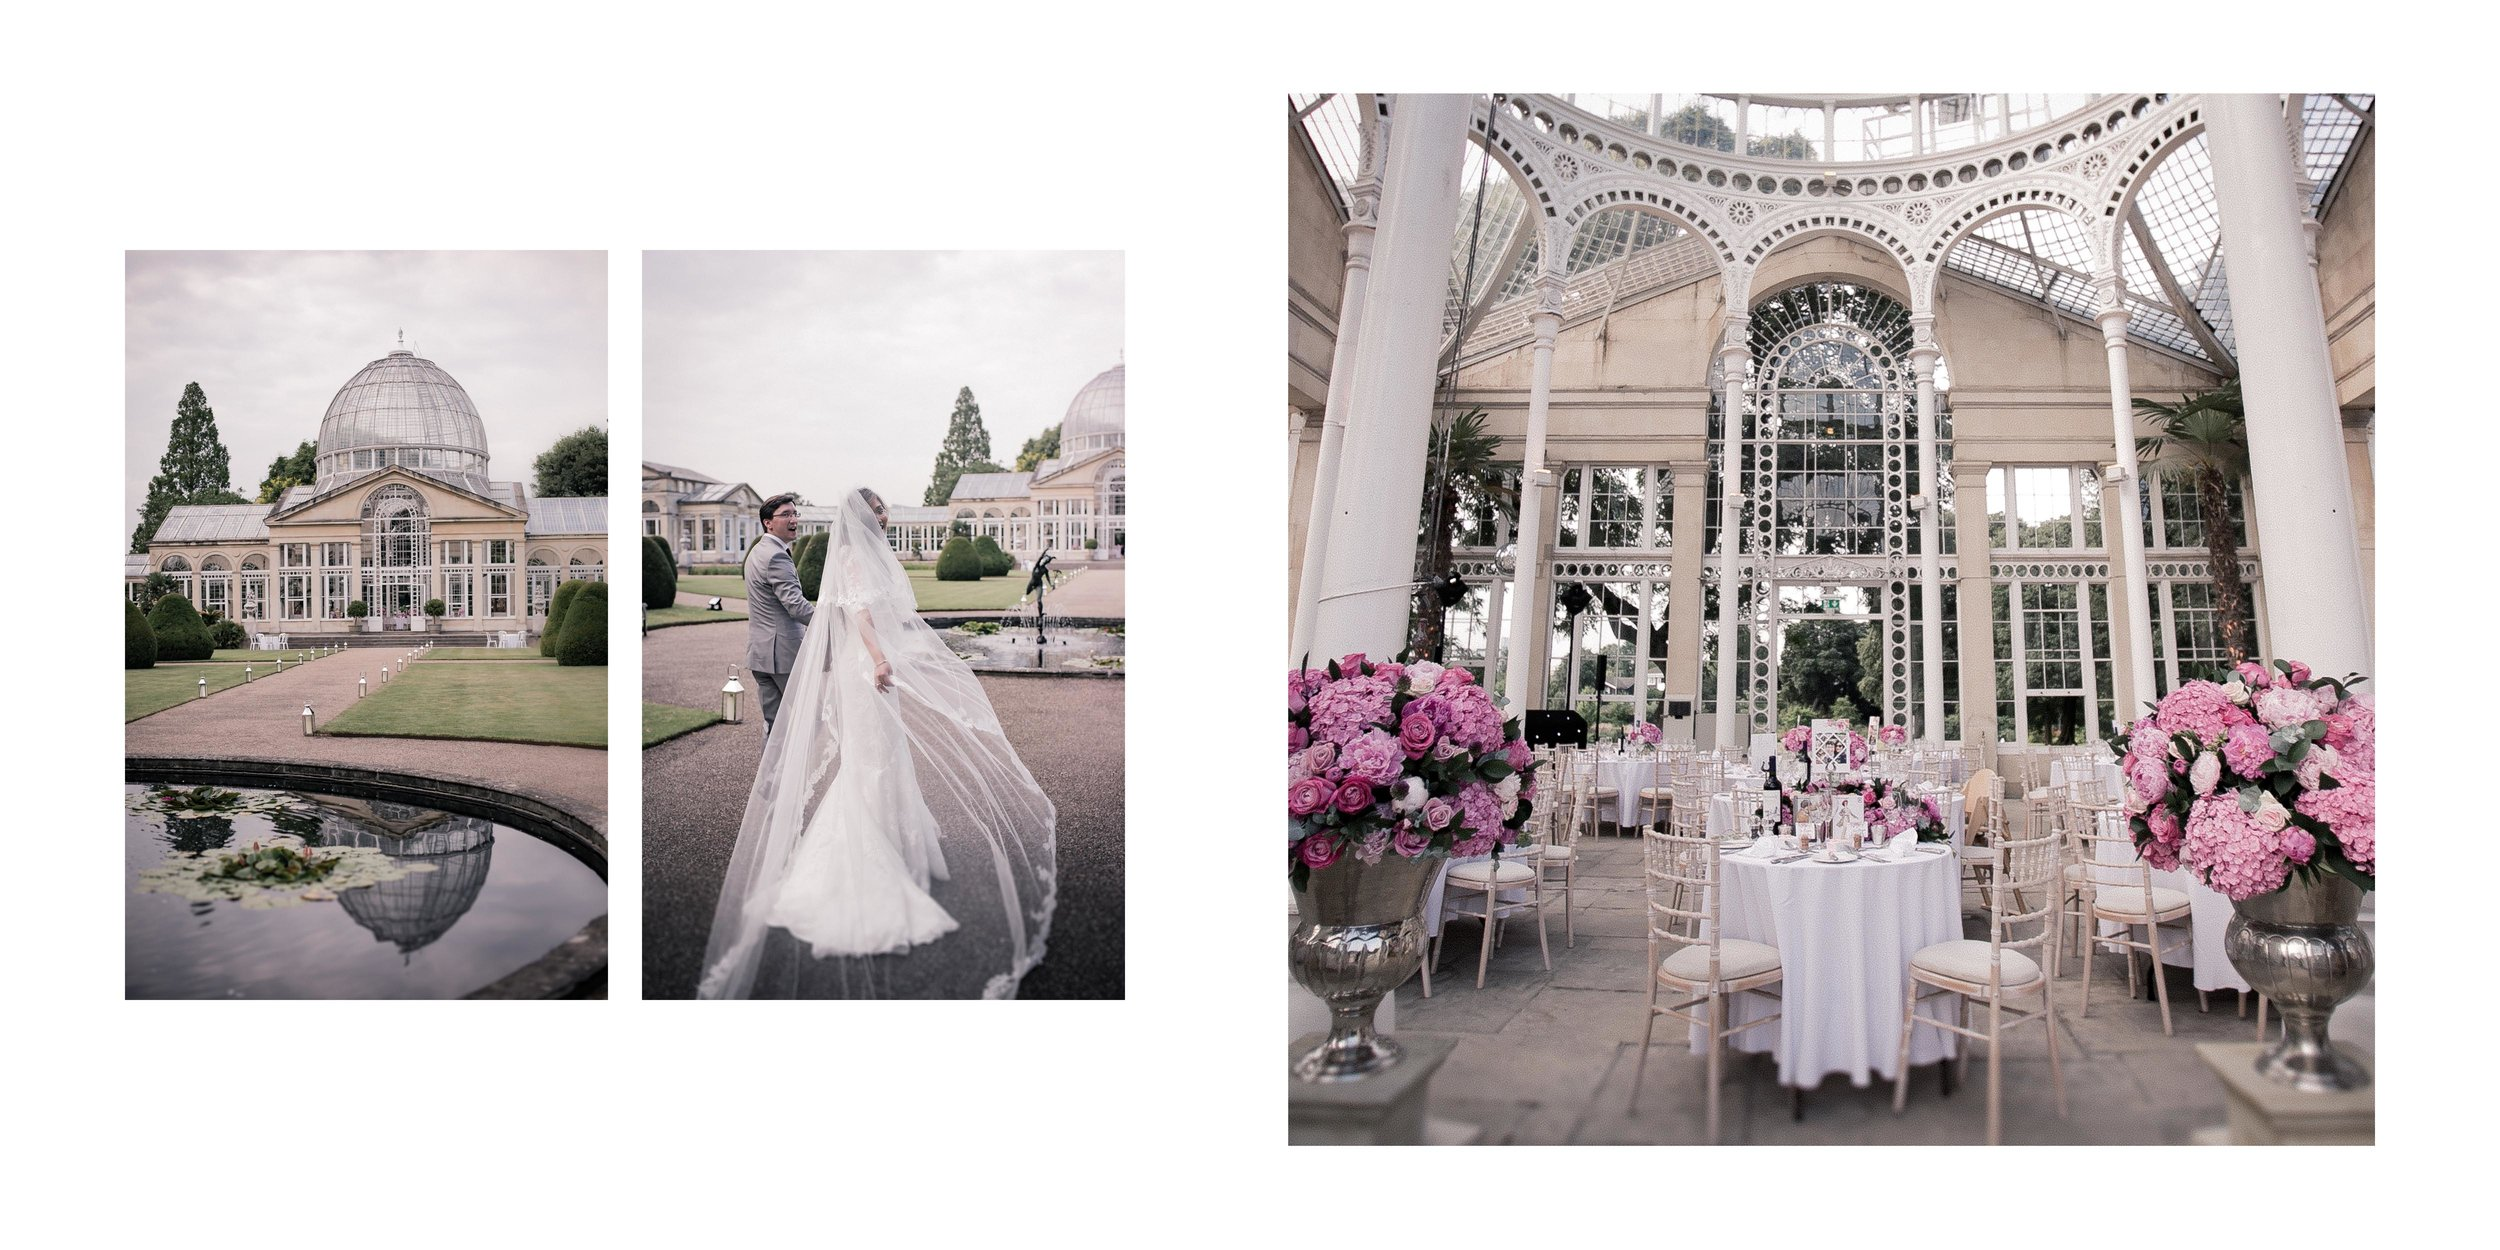 wedding_photographer_surrey_43.jpg